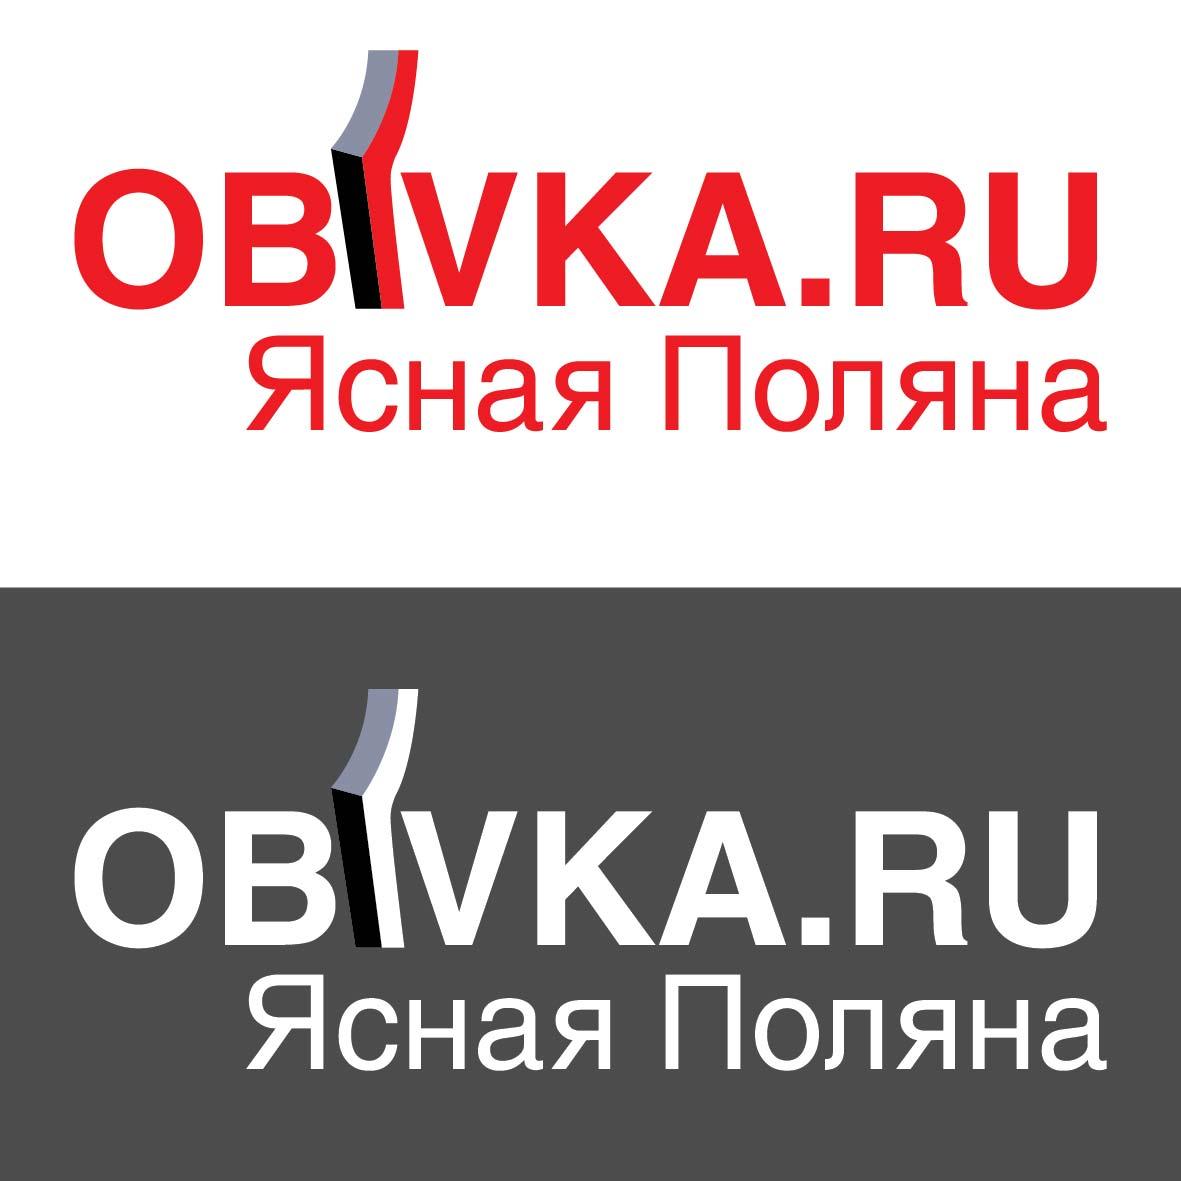 Логотип для сайта OBIVKA.RU фото f_3235c11242c77cda.jpg